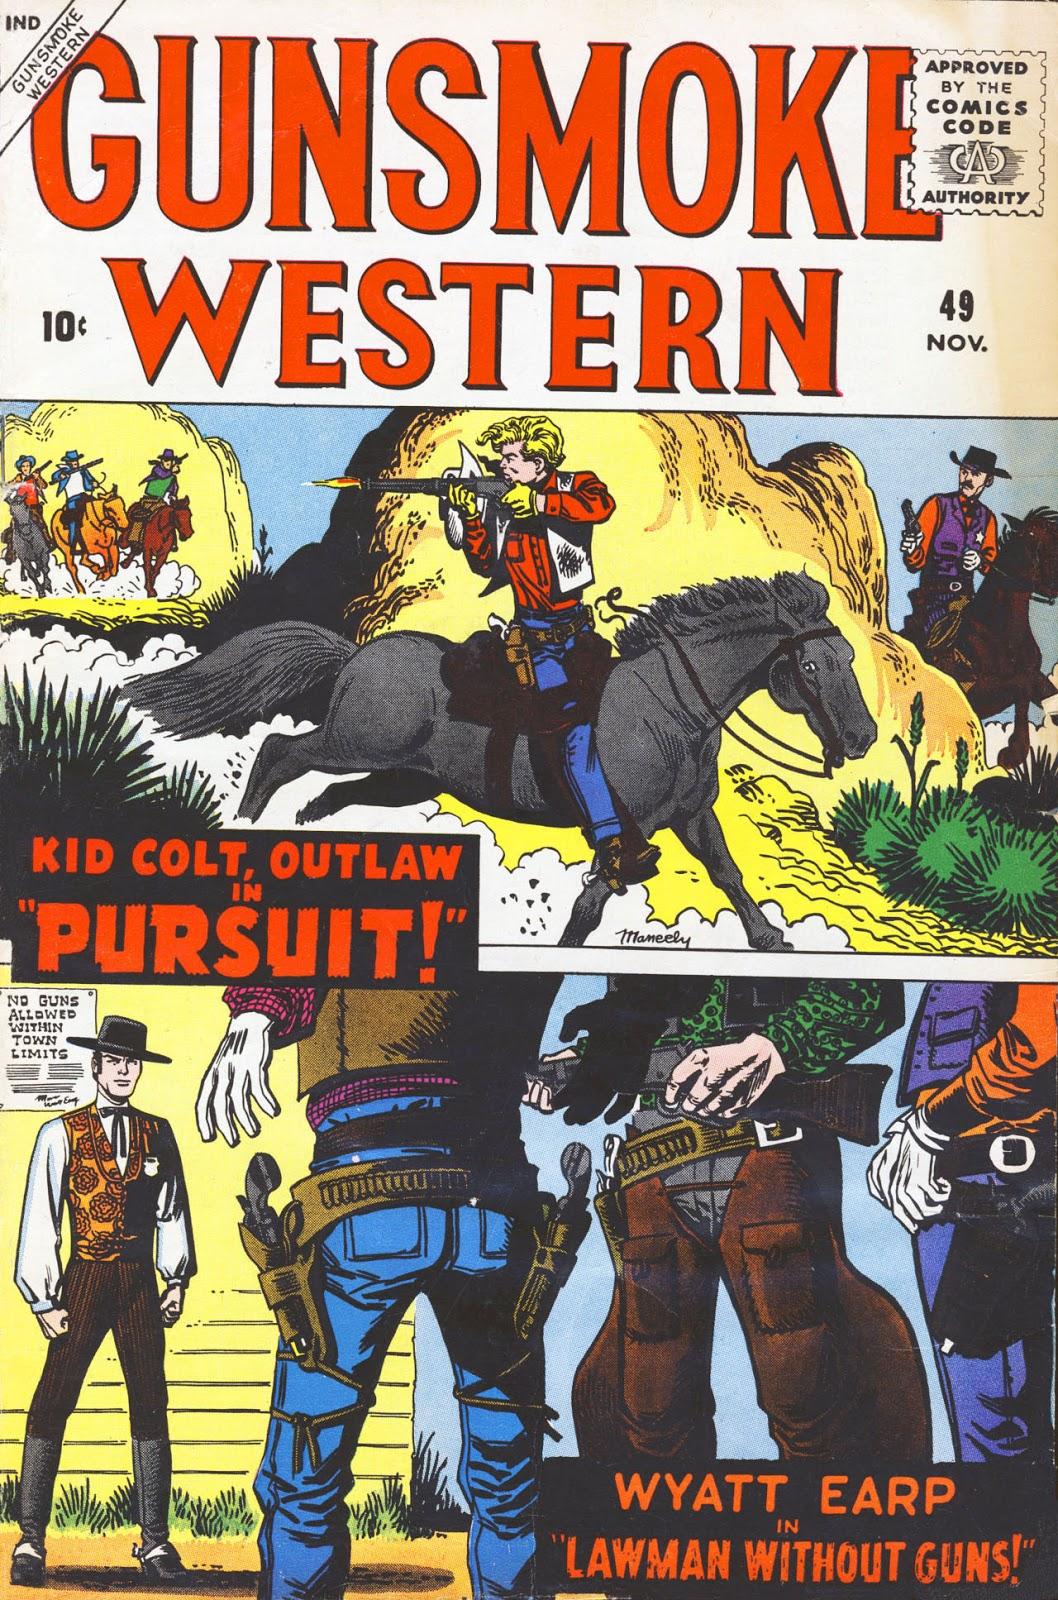 Gunsmoke Western issue 49 - Page 1